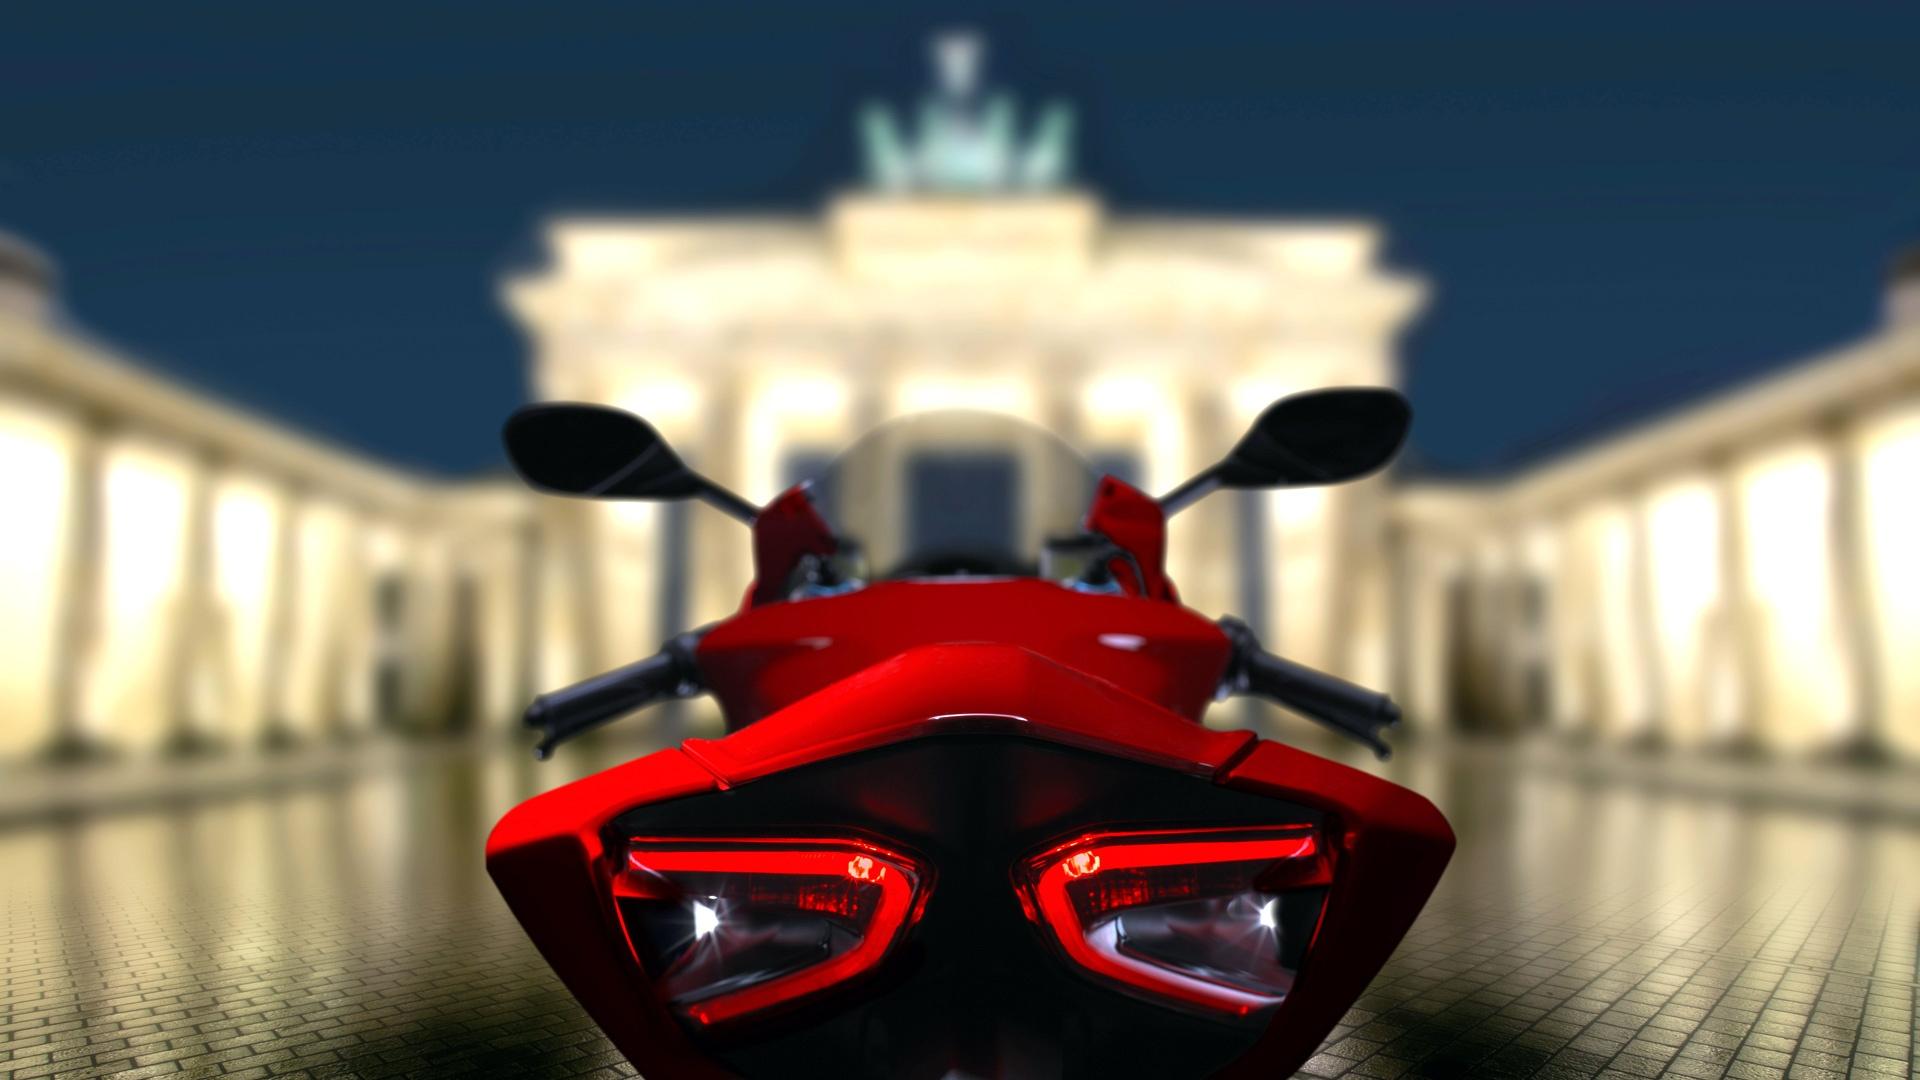 Ducati Berlin Brandenburgertor